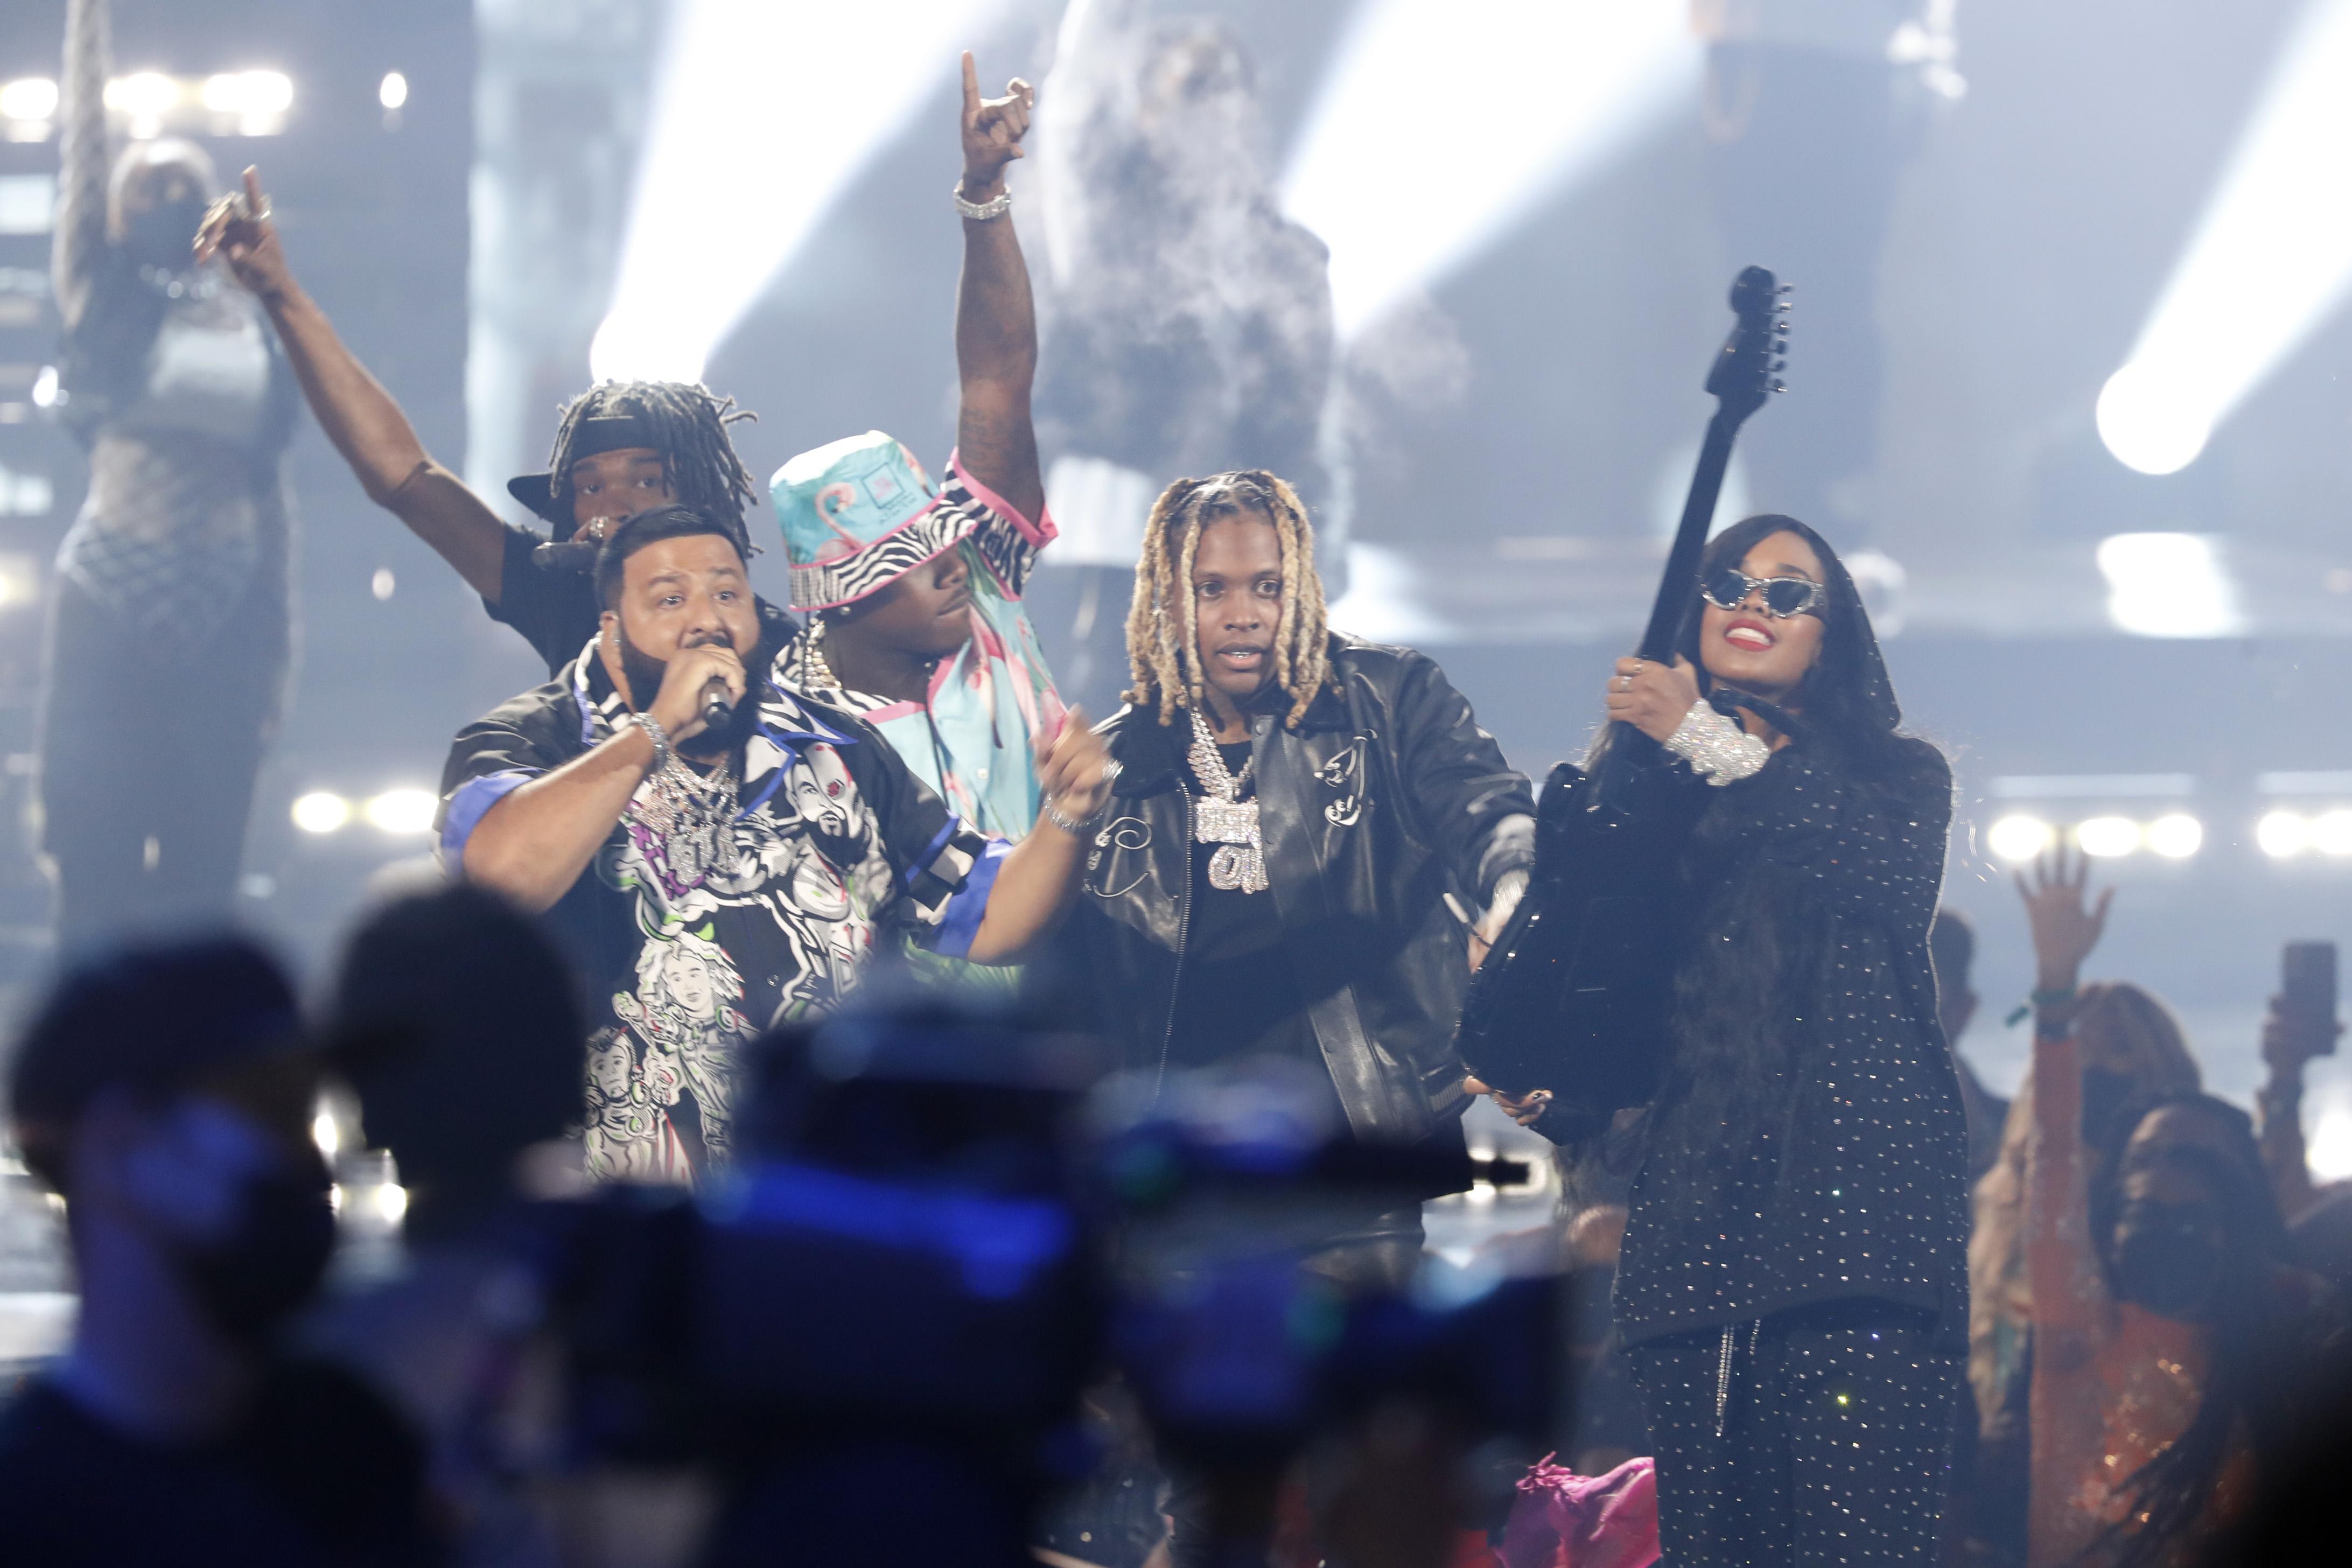 DJ Khaled, DaBaby, Lil Durk, Lil Baby, H.E.R.